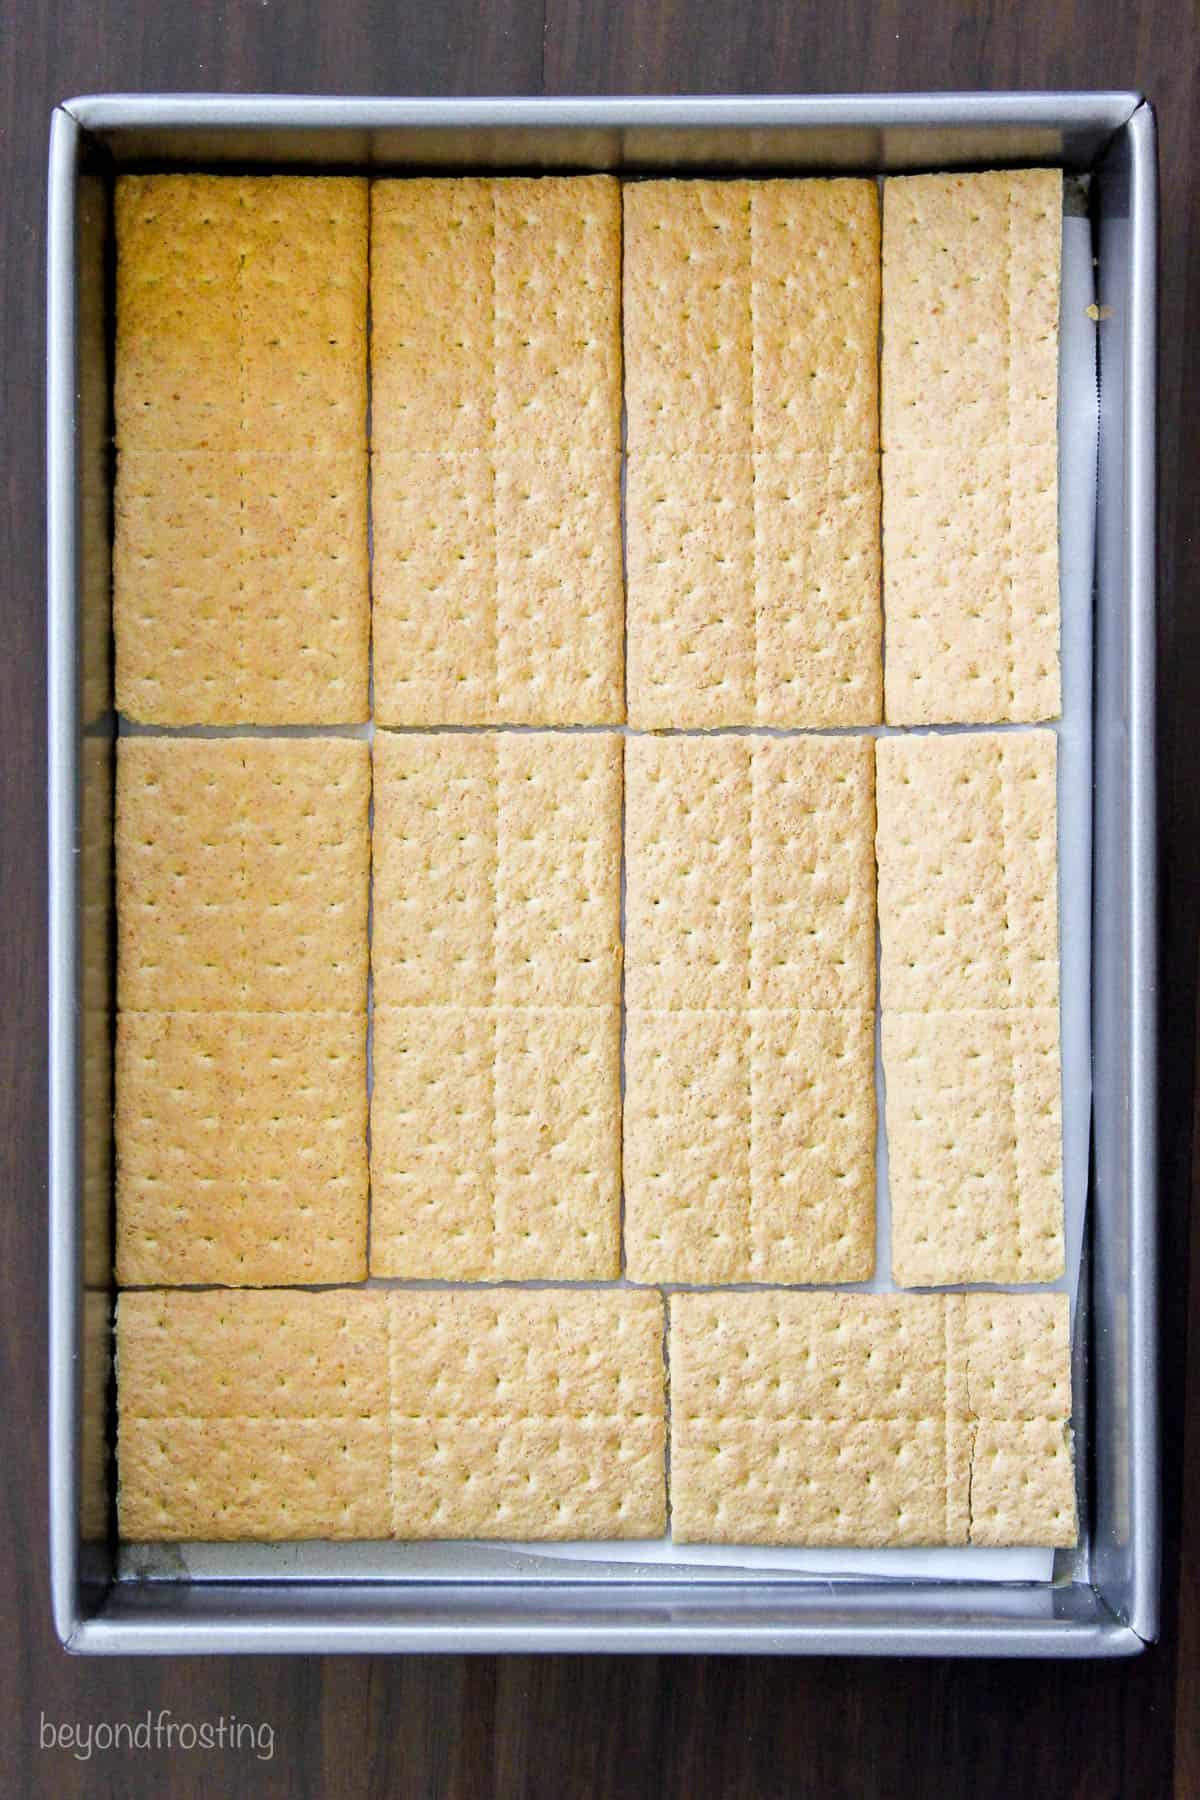 graham crackers layered in baking dish